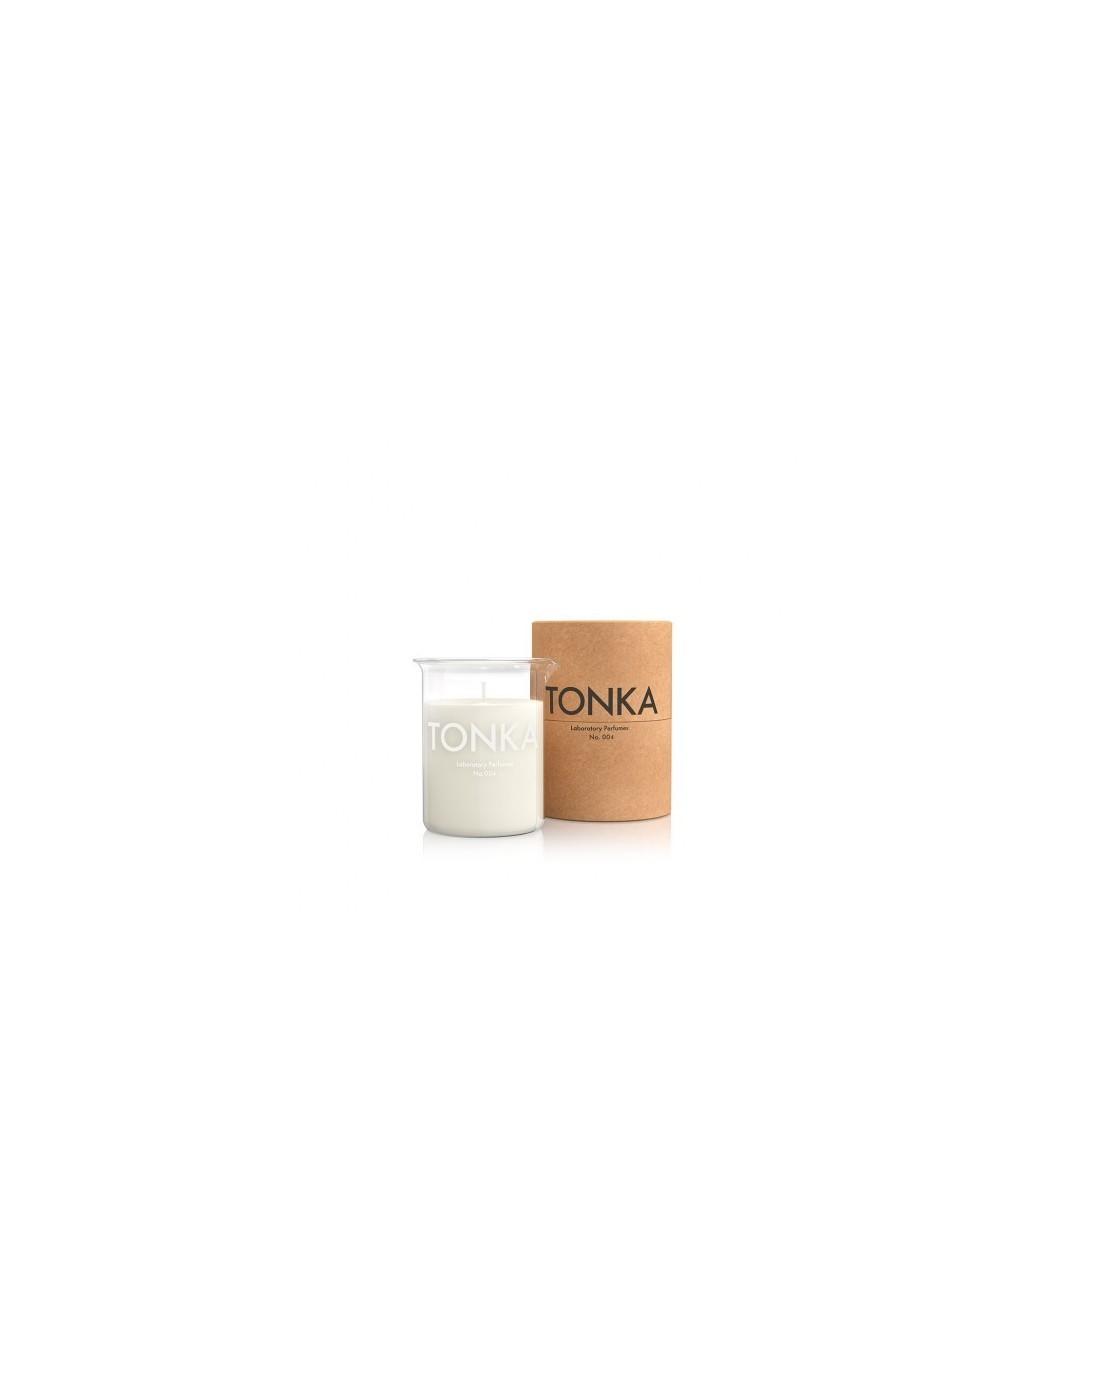 Laboratory Perfumes Tonka Candela 200g  5060385330067